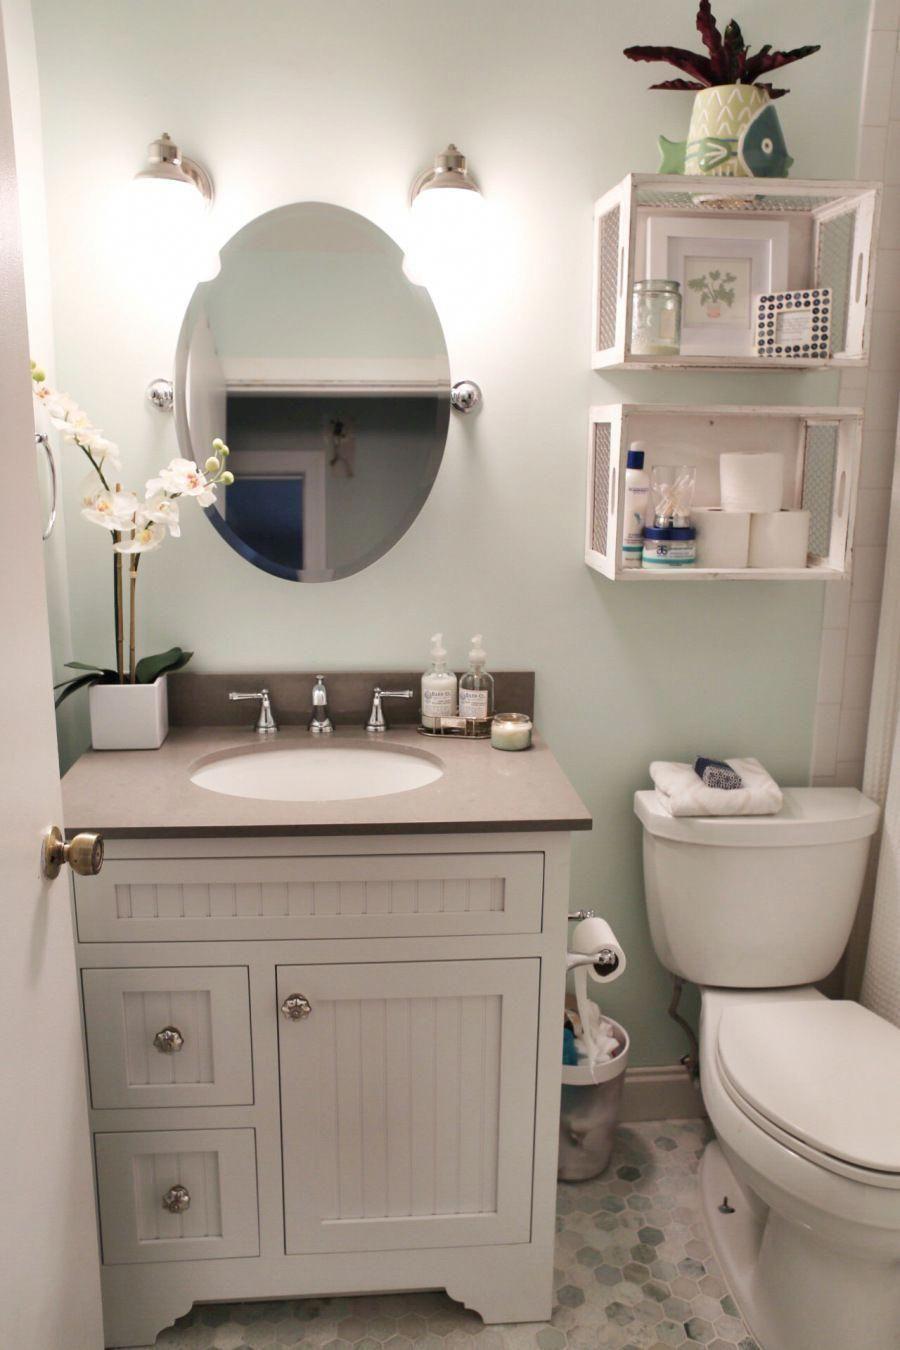 54 Half Bathroom Ideas For Beautiful Bathroom Design On A ...